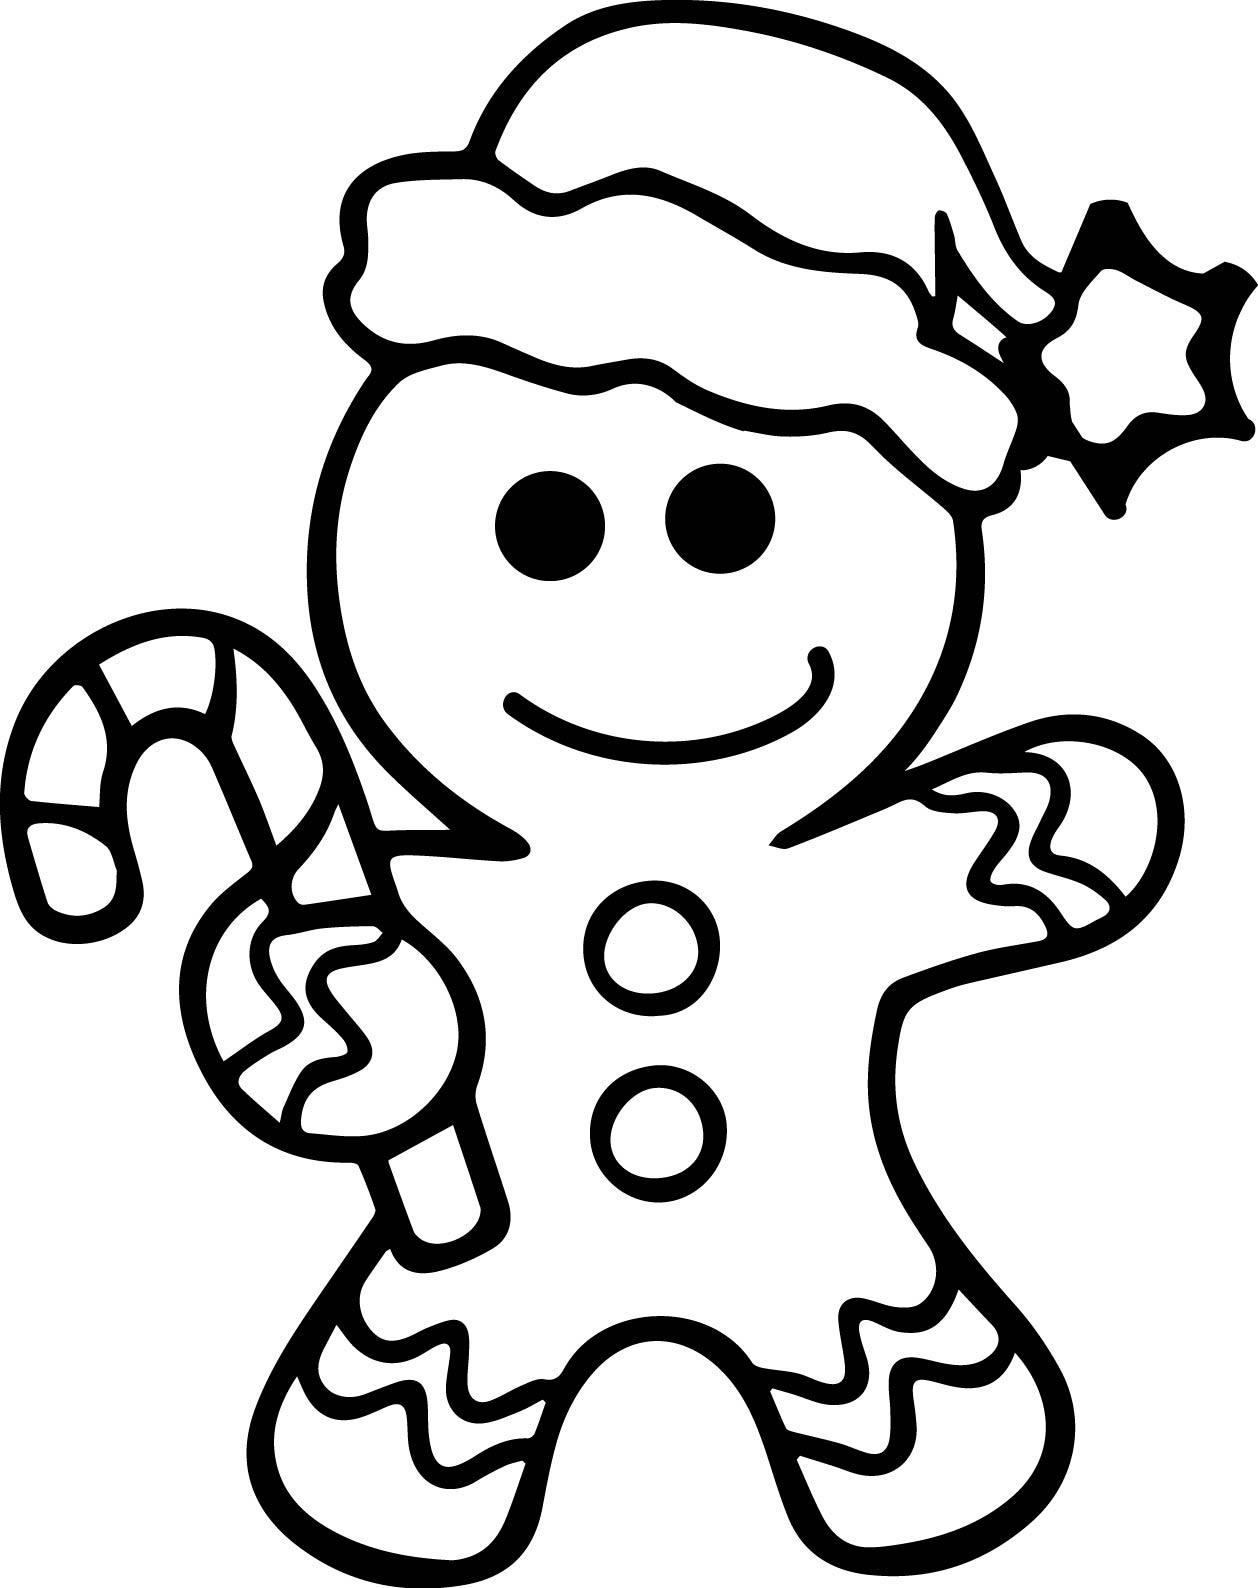 gingerbread man coloring free printable gingerbread man coloring pages for kids gingerbread man coloring